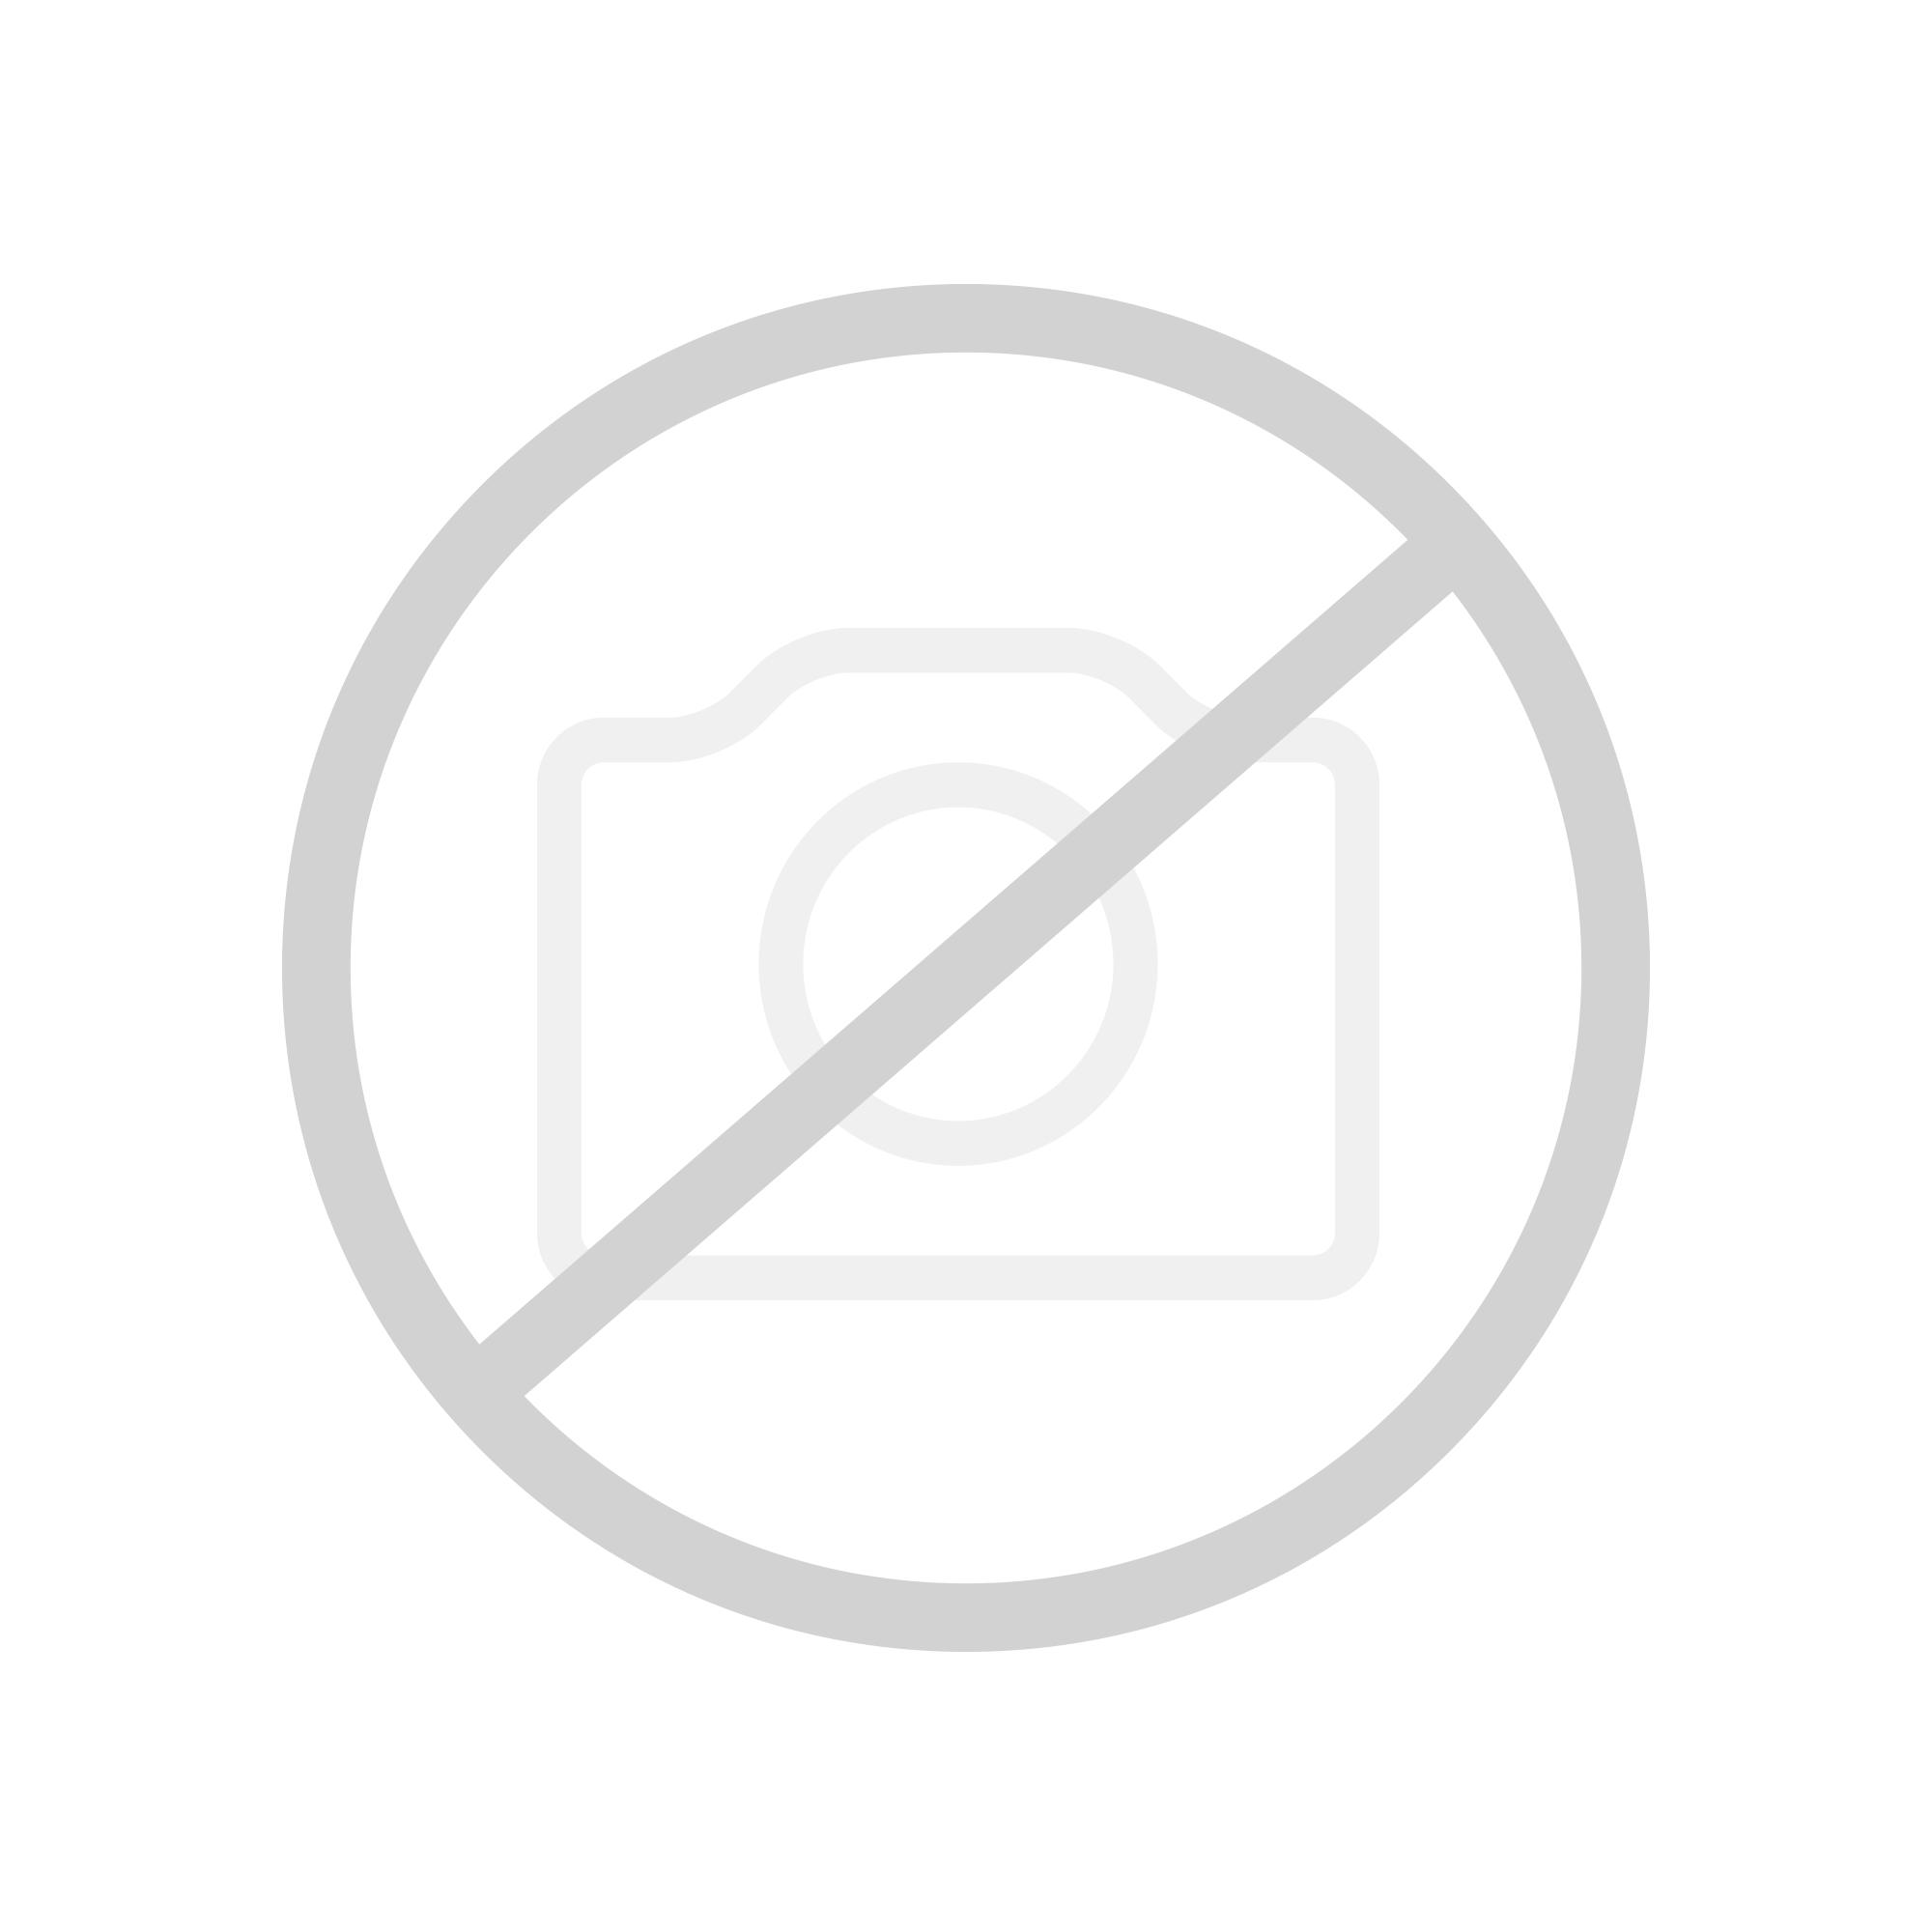 bette starlet oval silhouette badewanne wanne wei ablaufgarnitur wei f r griffmontage 2700. Black Bedroom Furniture Sets. Home Design Ideas